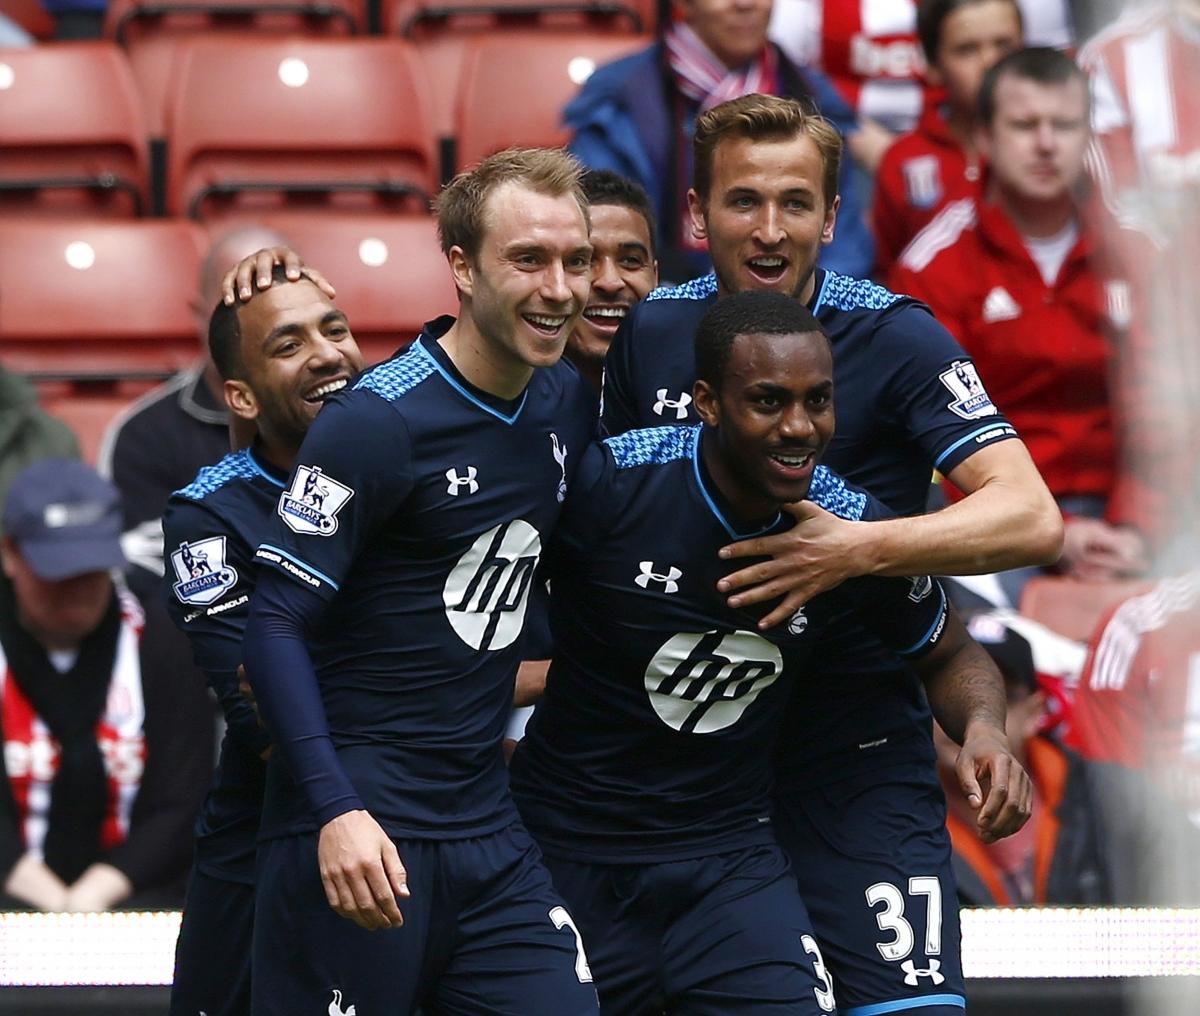 West Ham United V Tottenham Hotspur, Premier League: Where